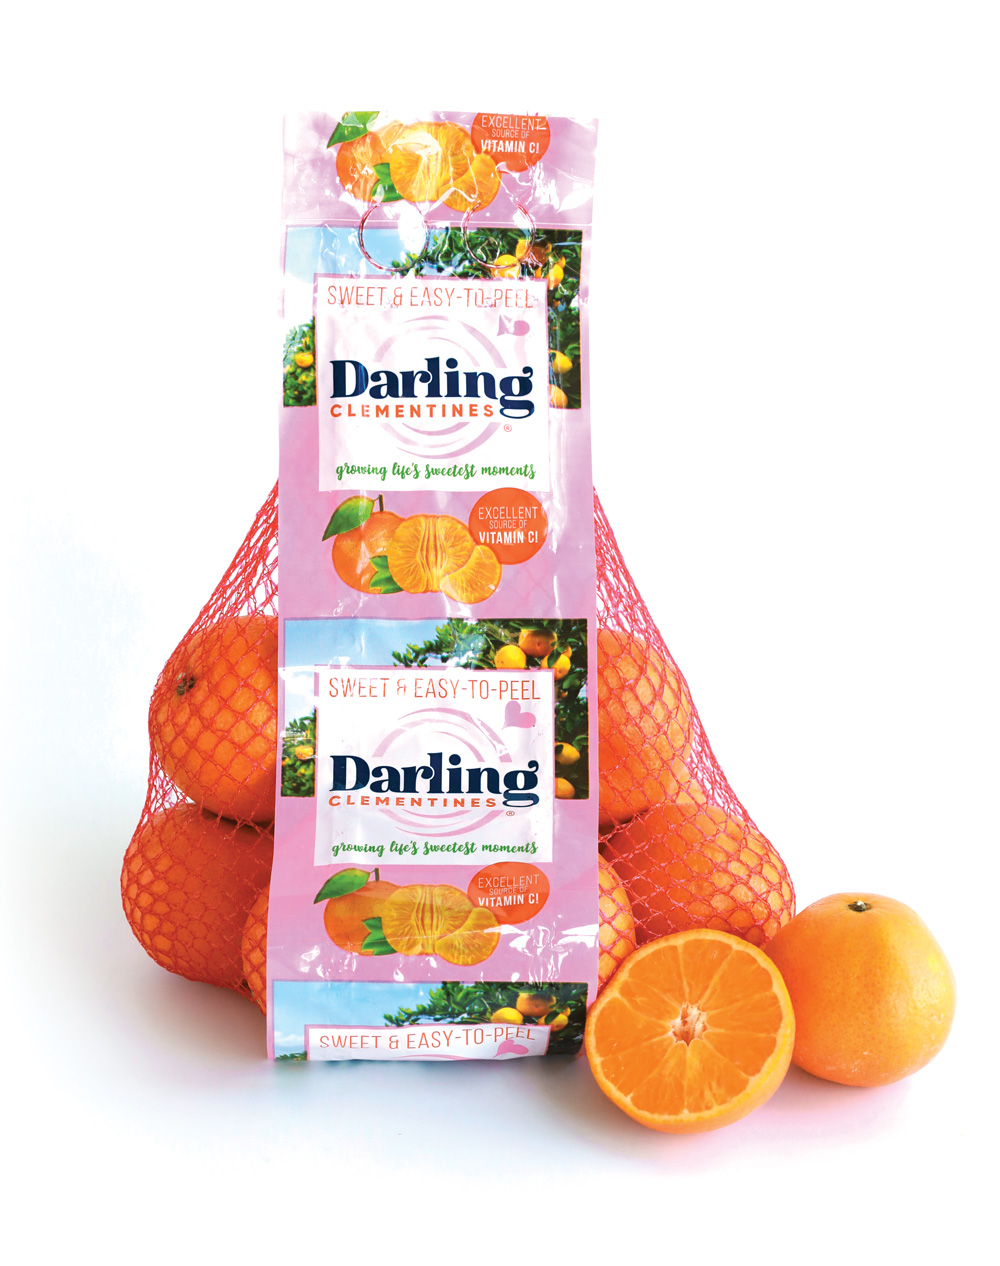 DarlingClem_PinkBag